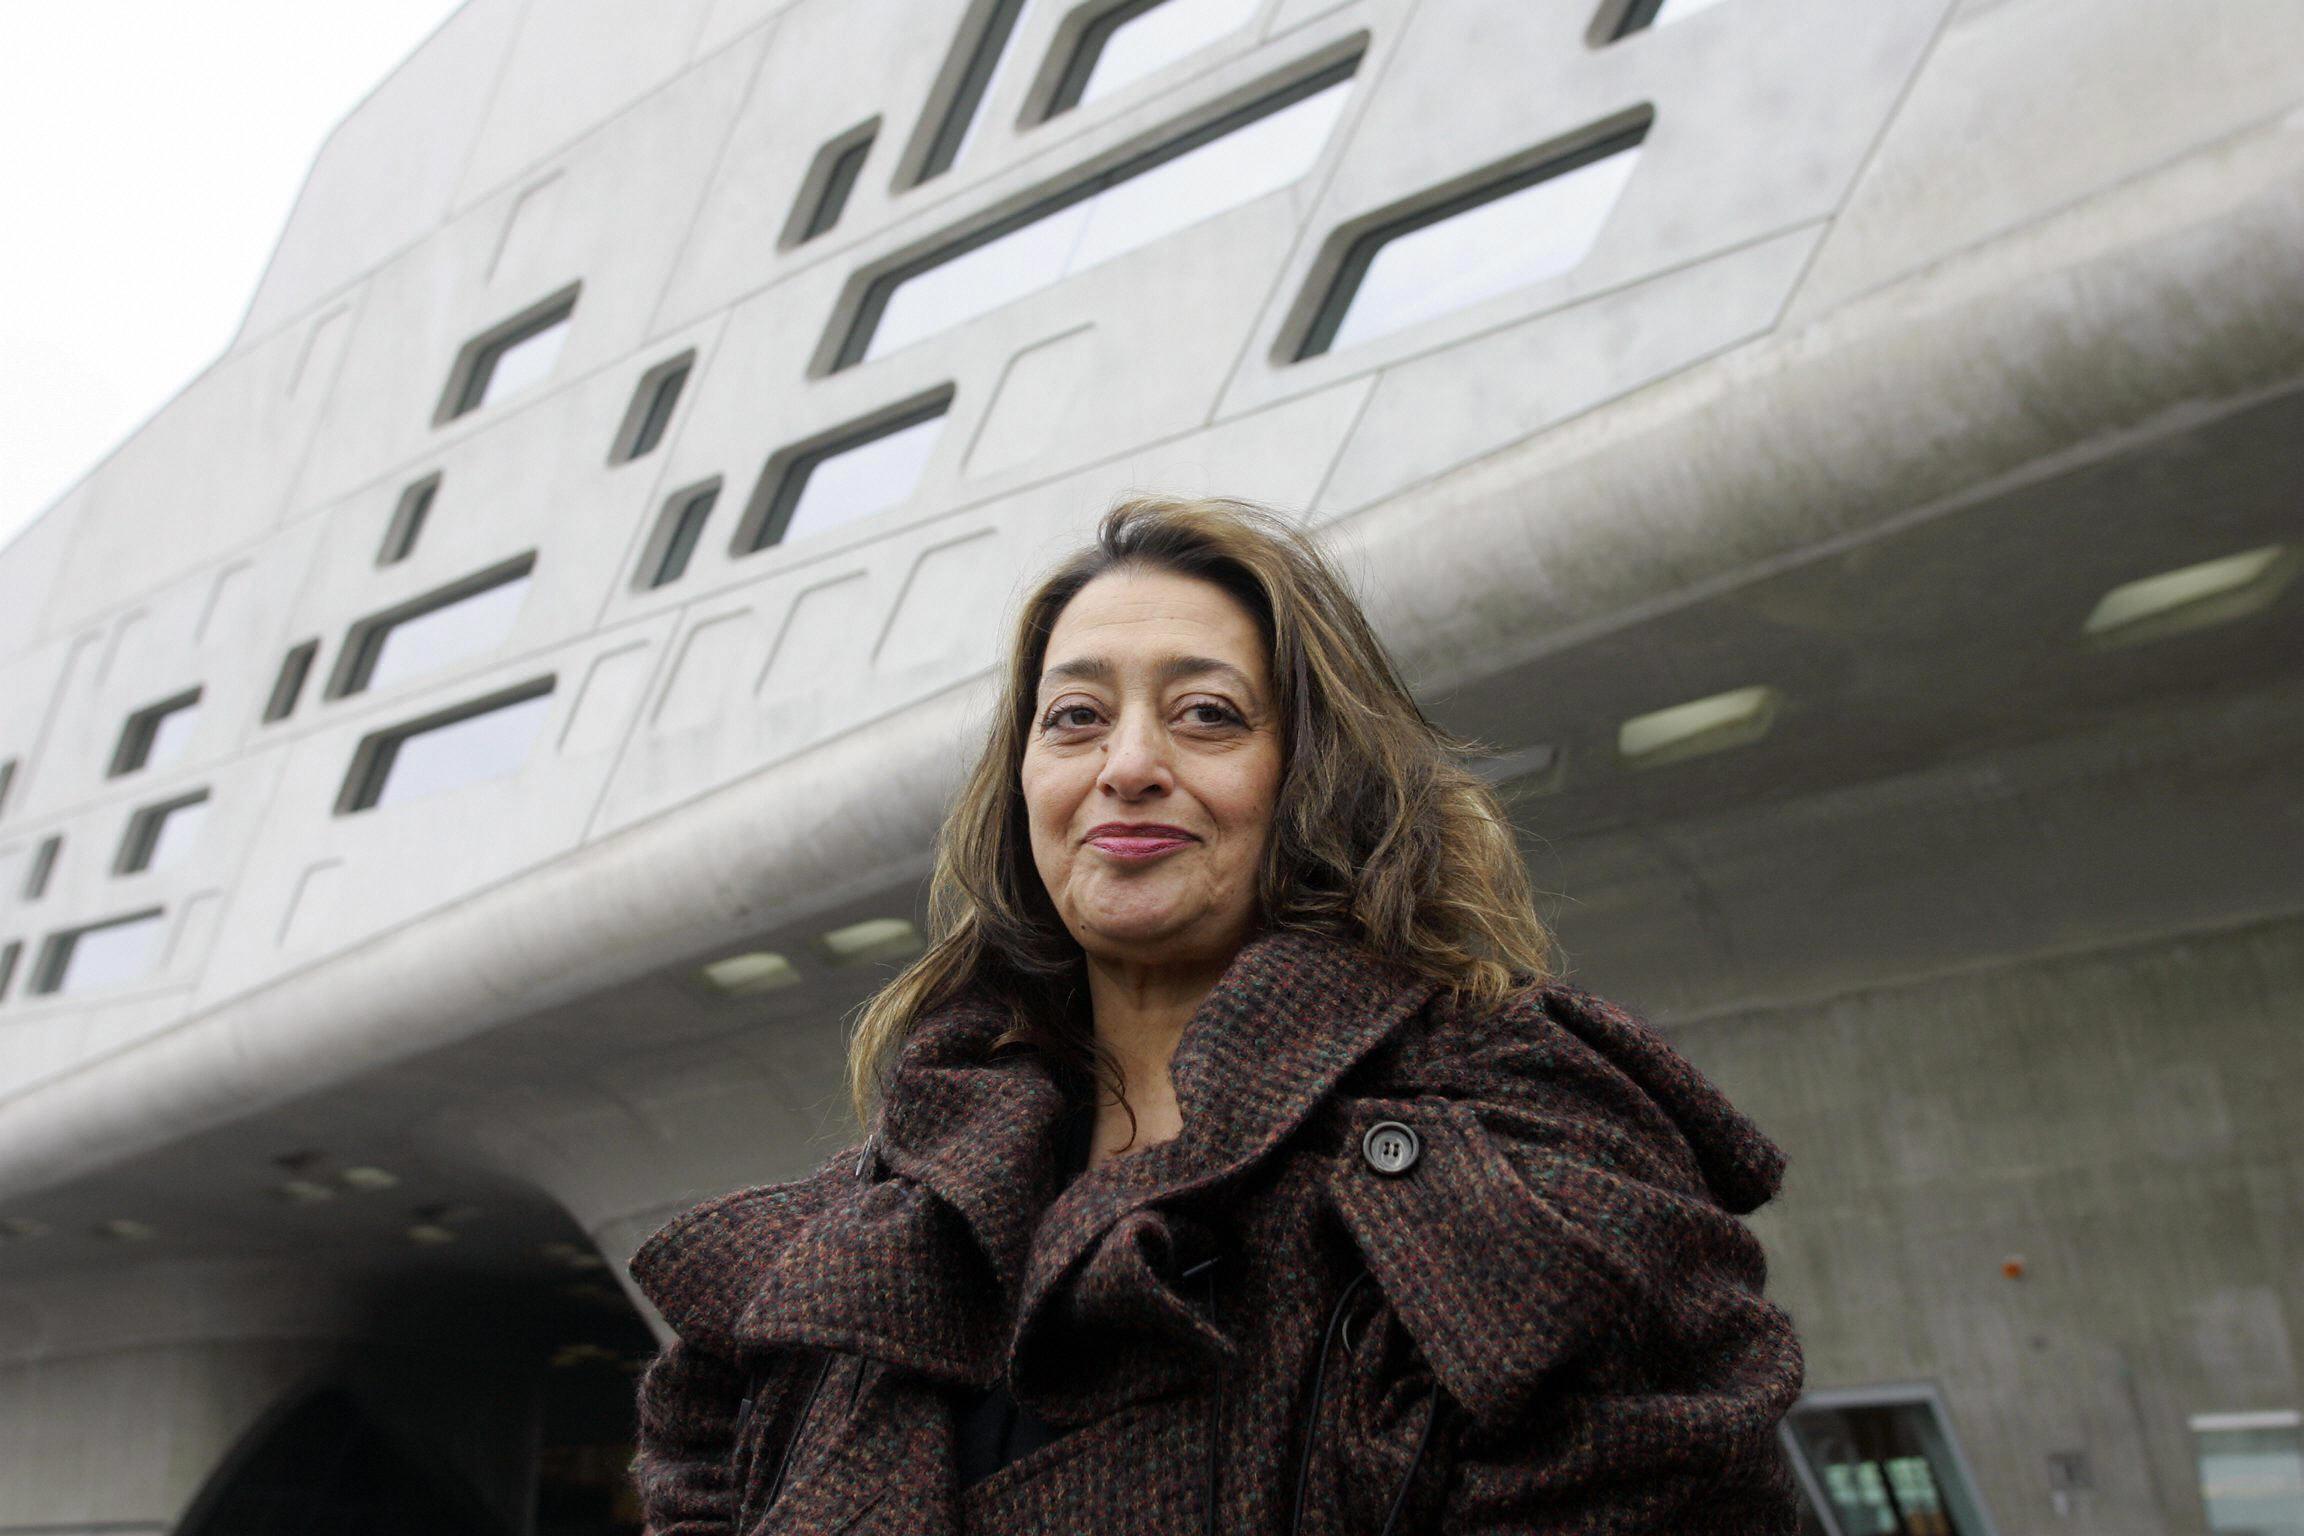 A Look Back at Zaha Hadid's Influence on Fashion